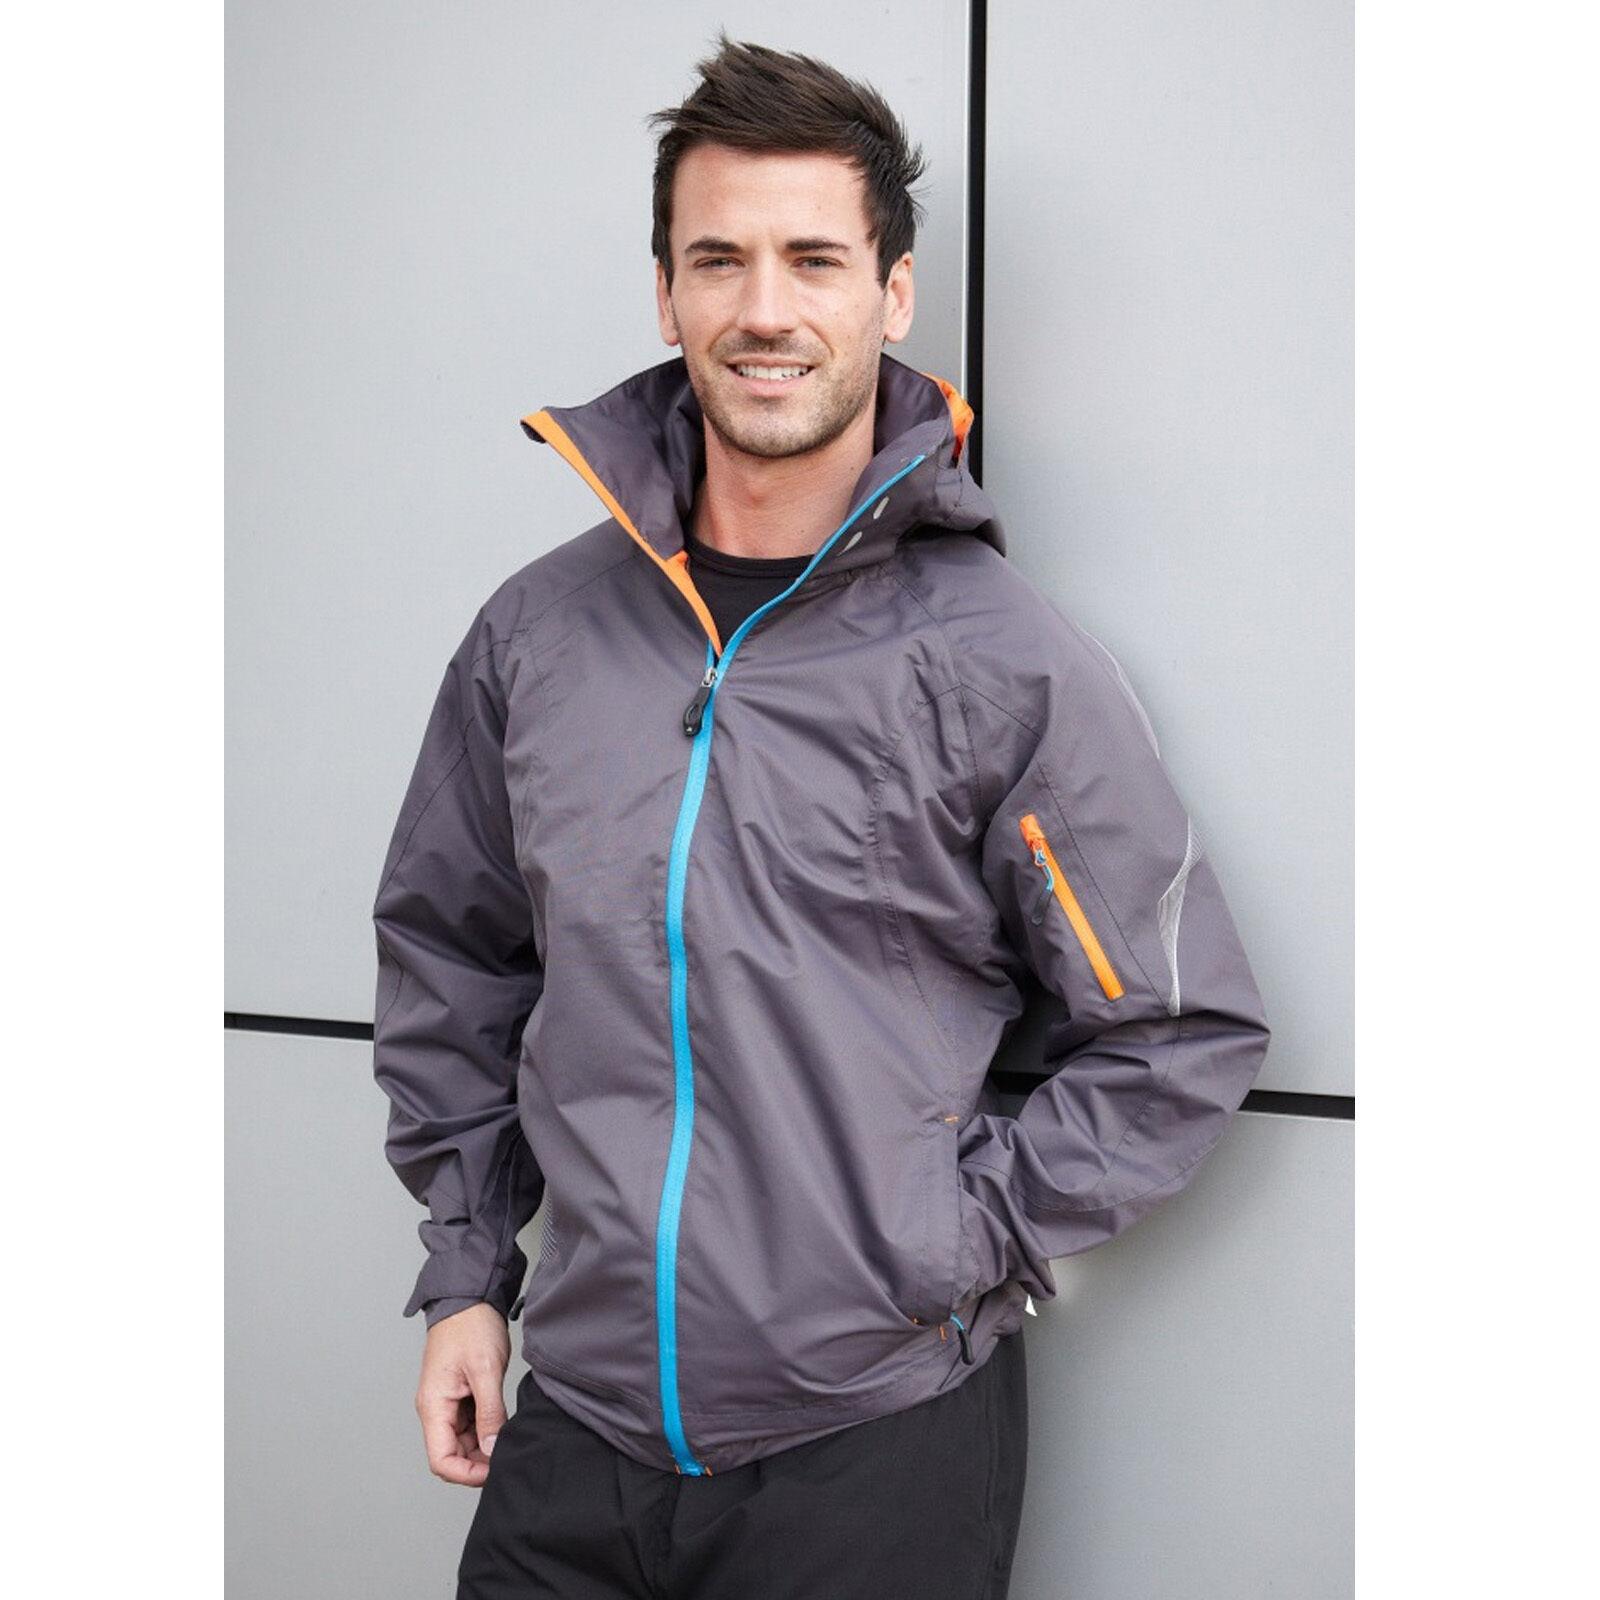 Dare 2b veste manteau homme inventive aRouge oser 5000 ski hiver oser aRouge être nouveau efa2eb